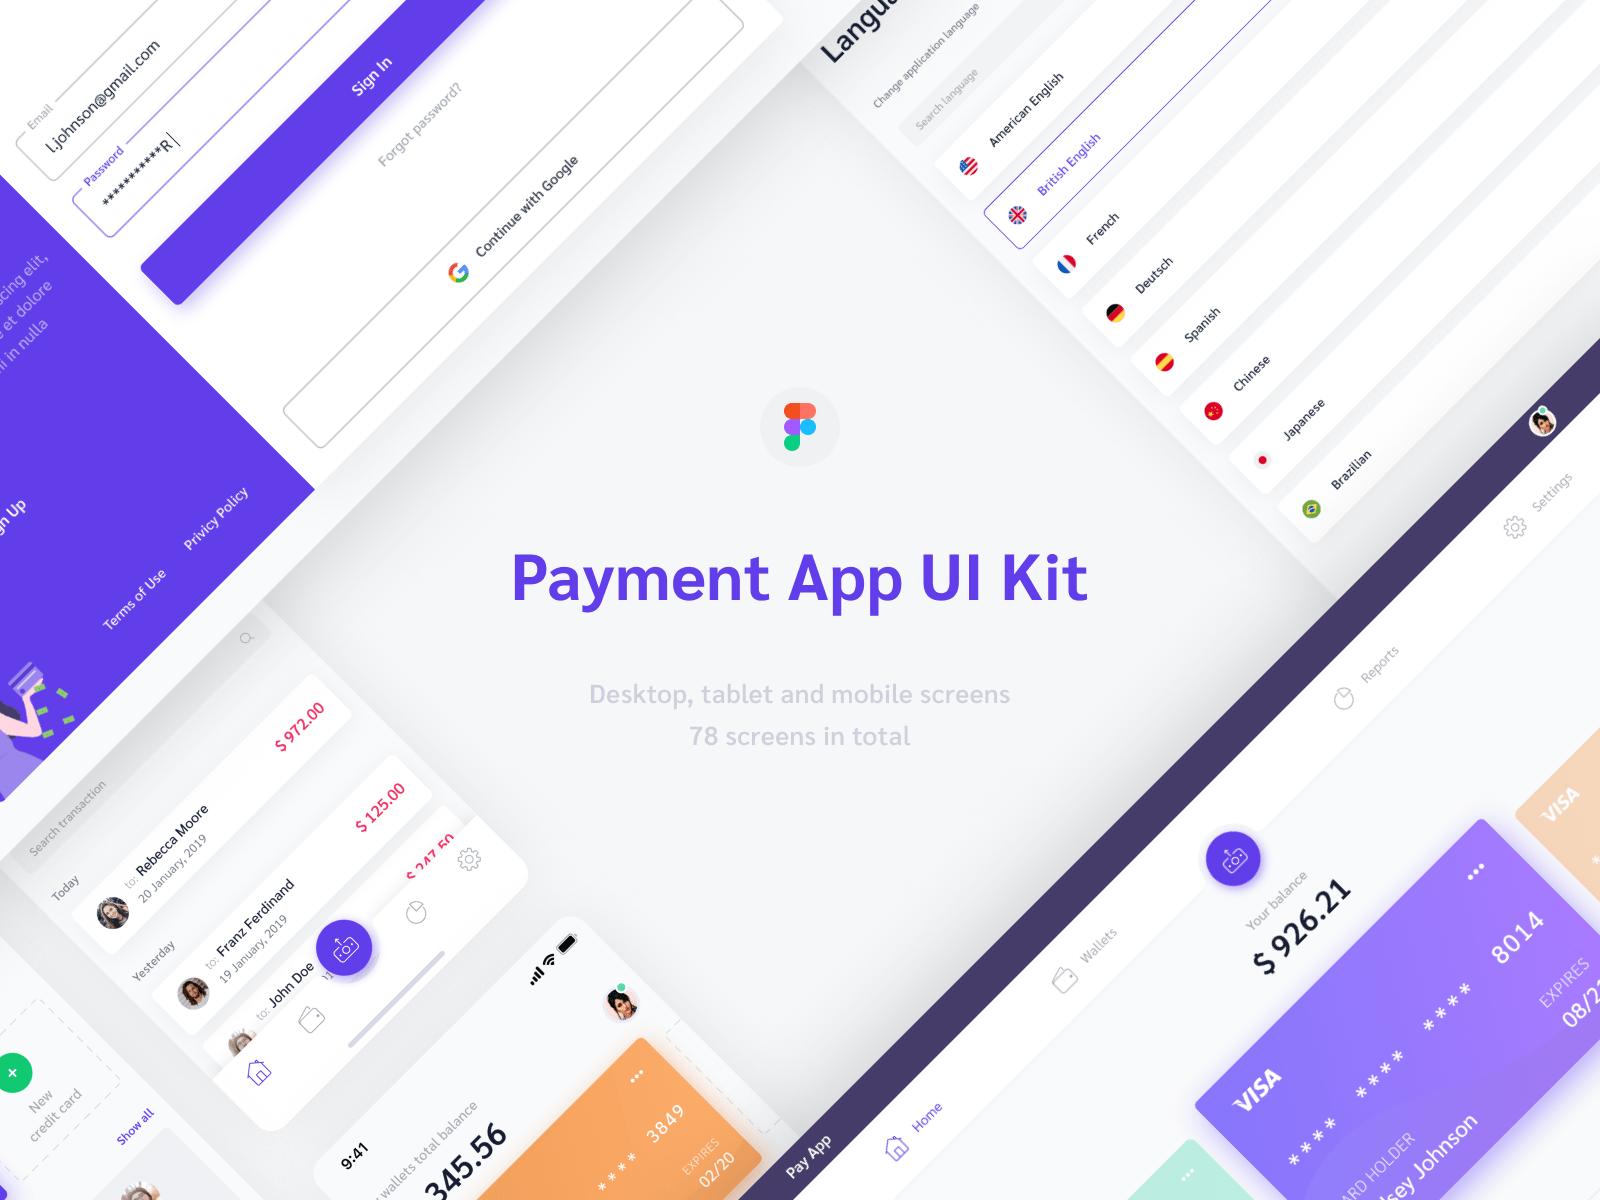 payment app UI kit